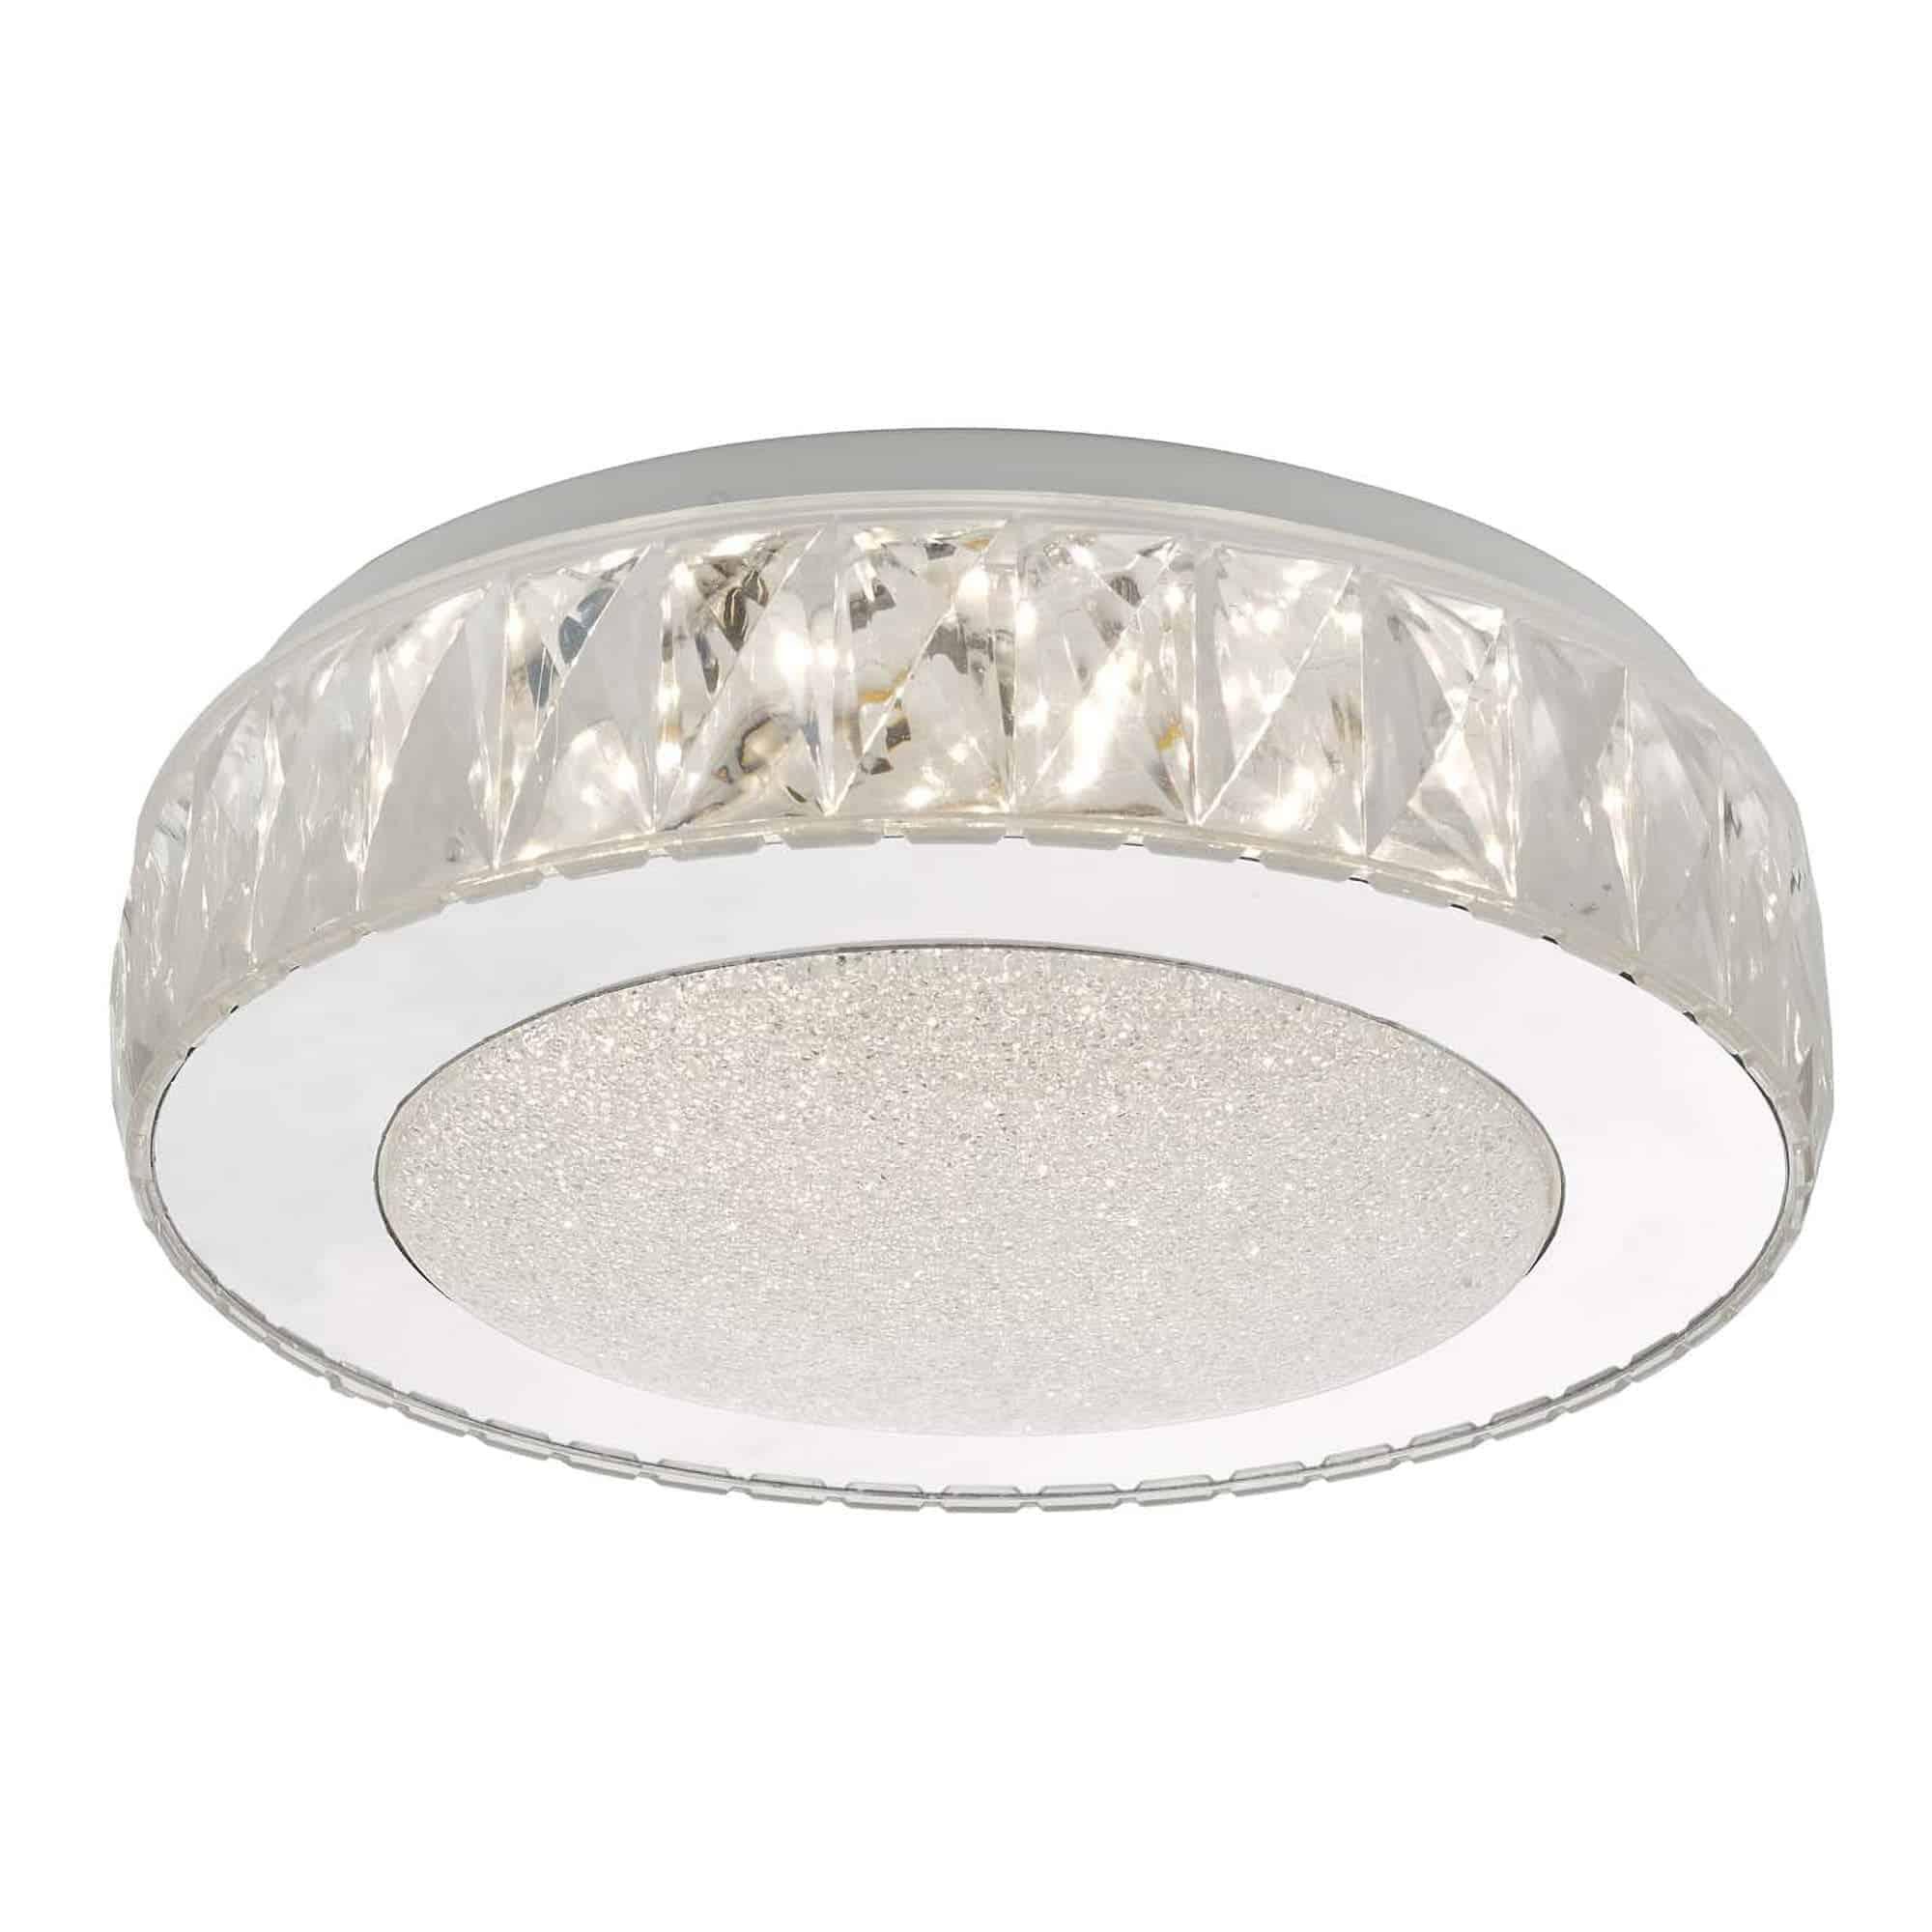 Dar AKE5208 Akelia Flush Acrylic & Stainless Steel Small LED